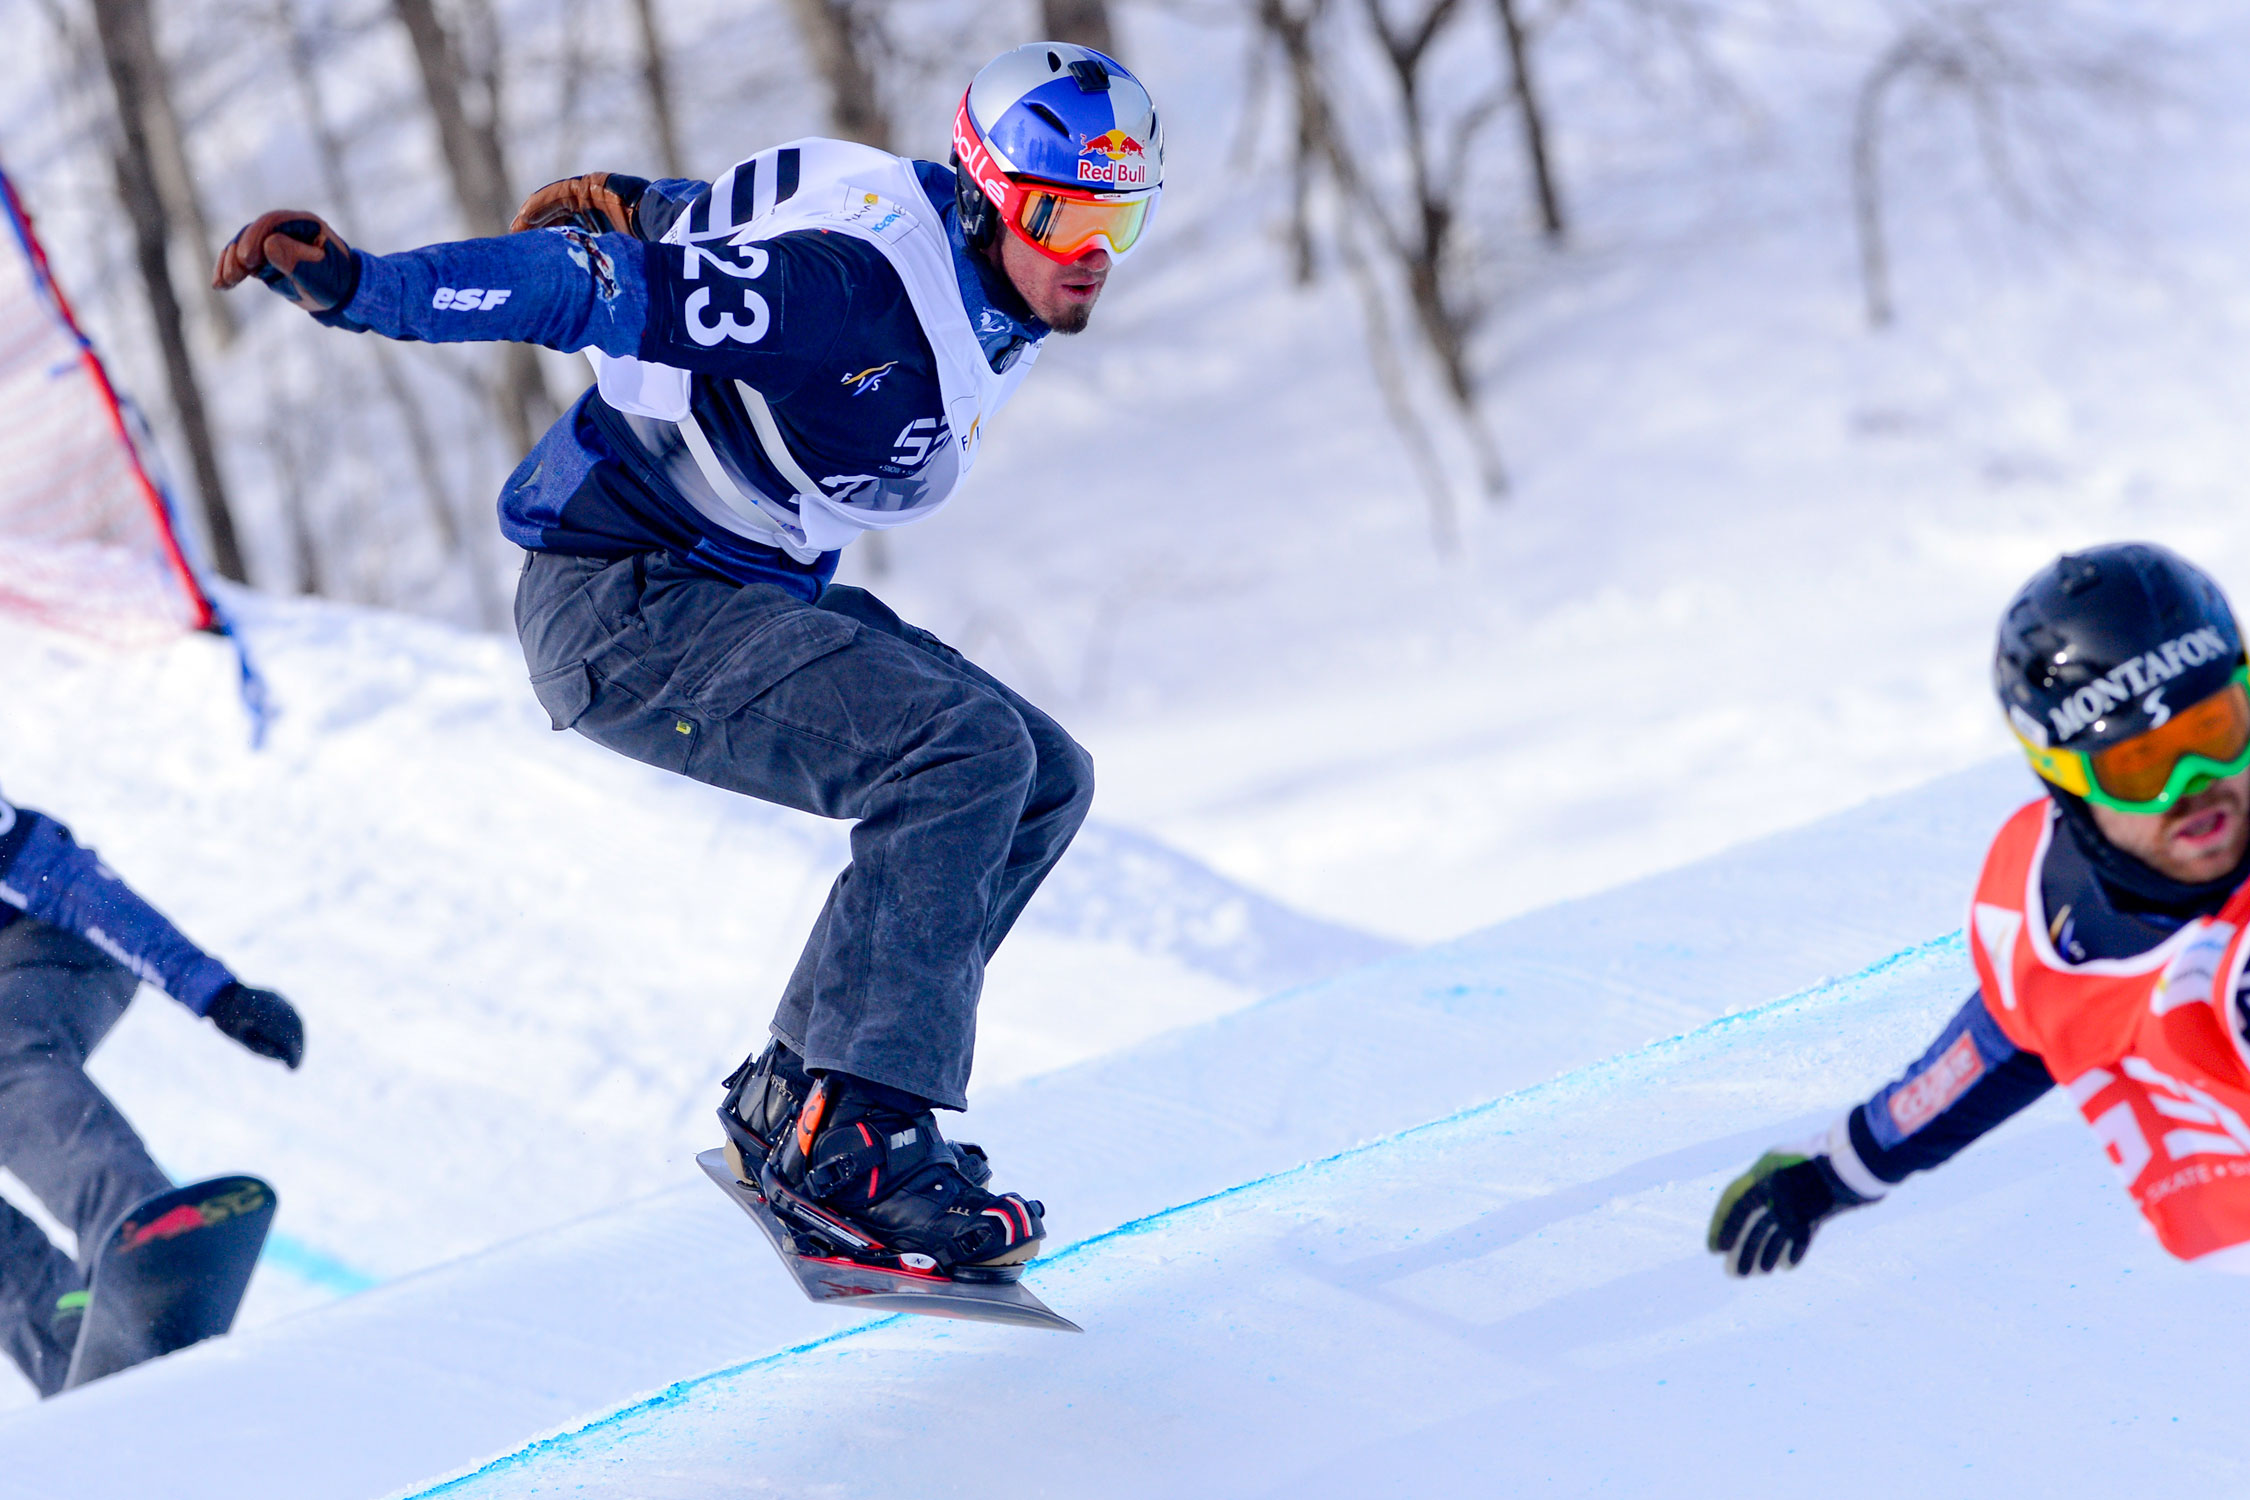 snowboard sotchi medaille pierre vaultier boardercross victoire